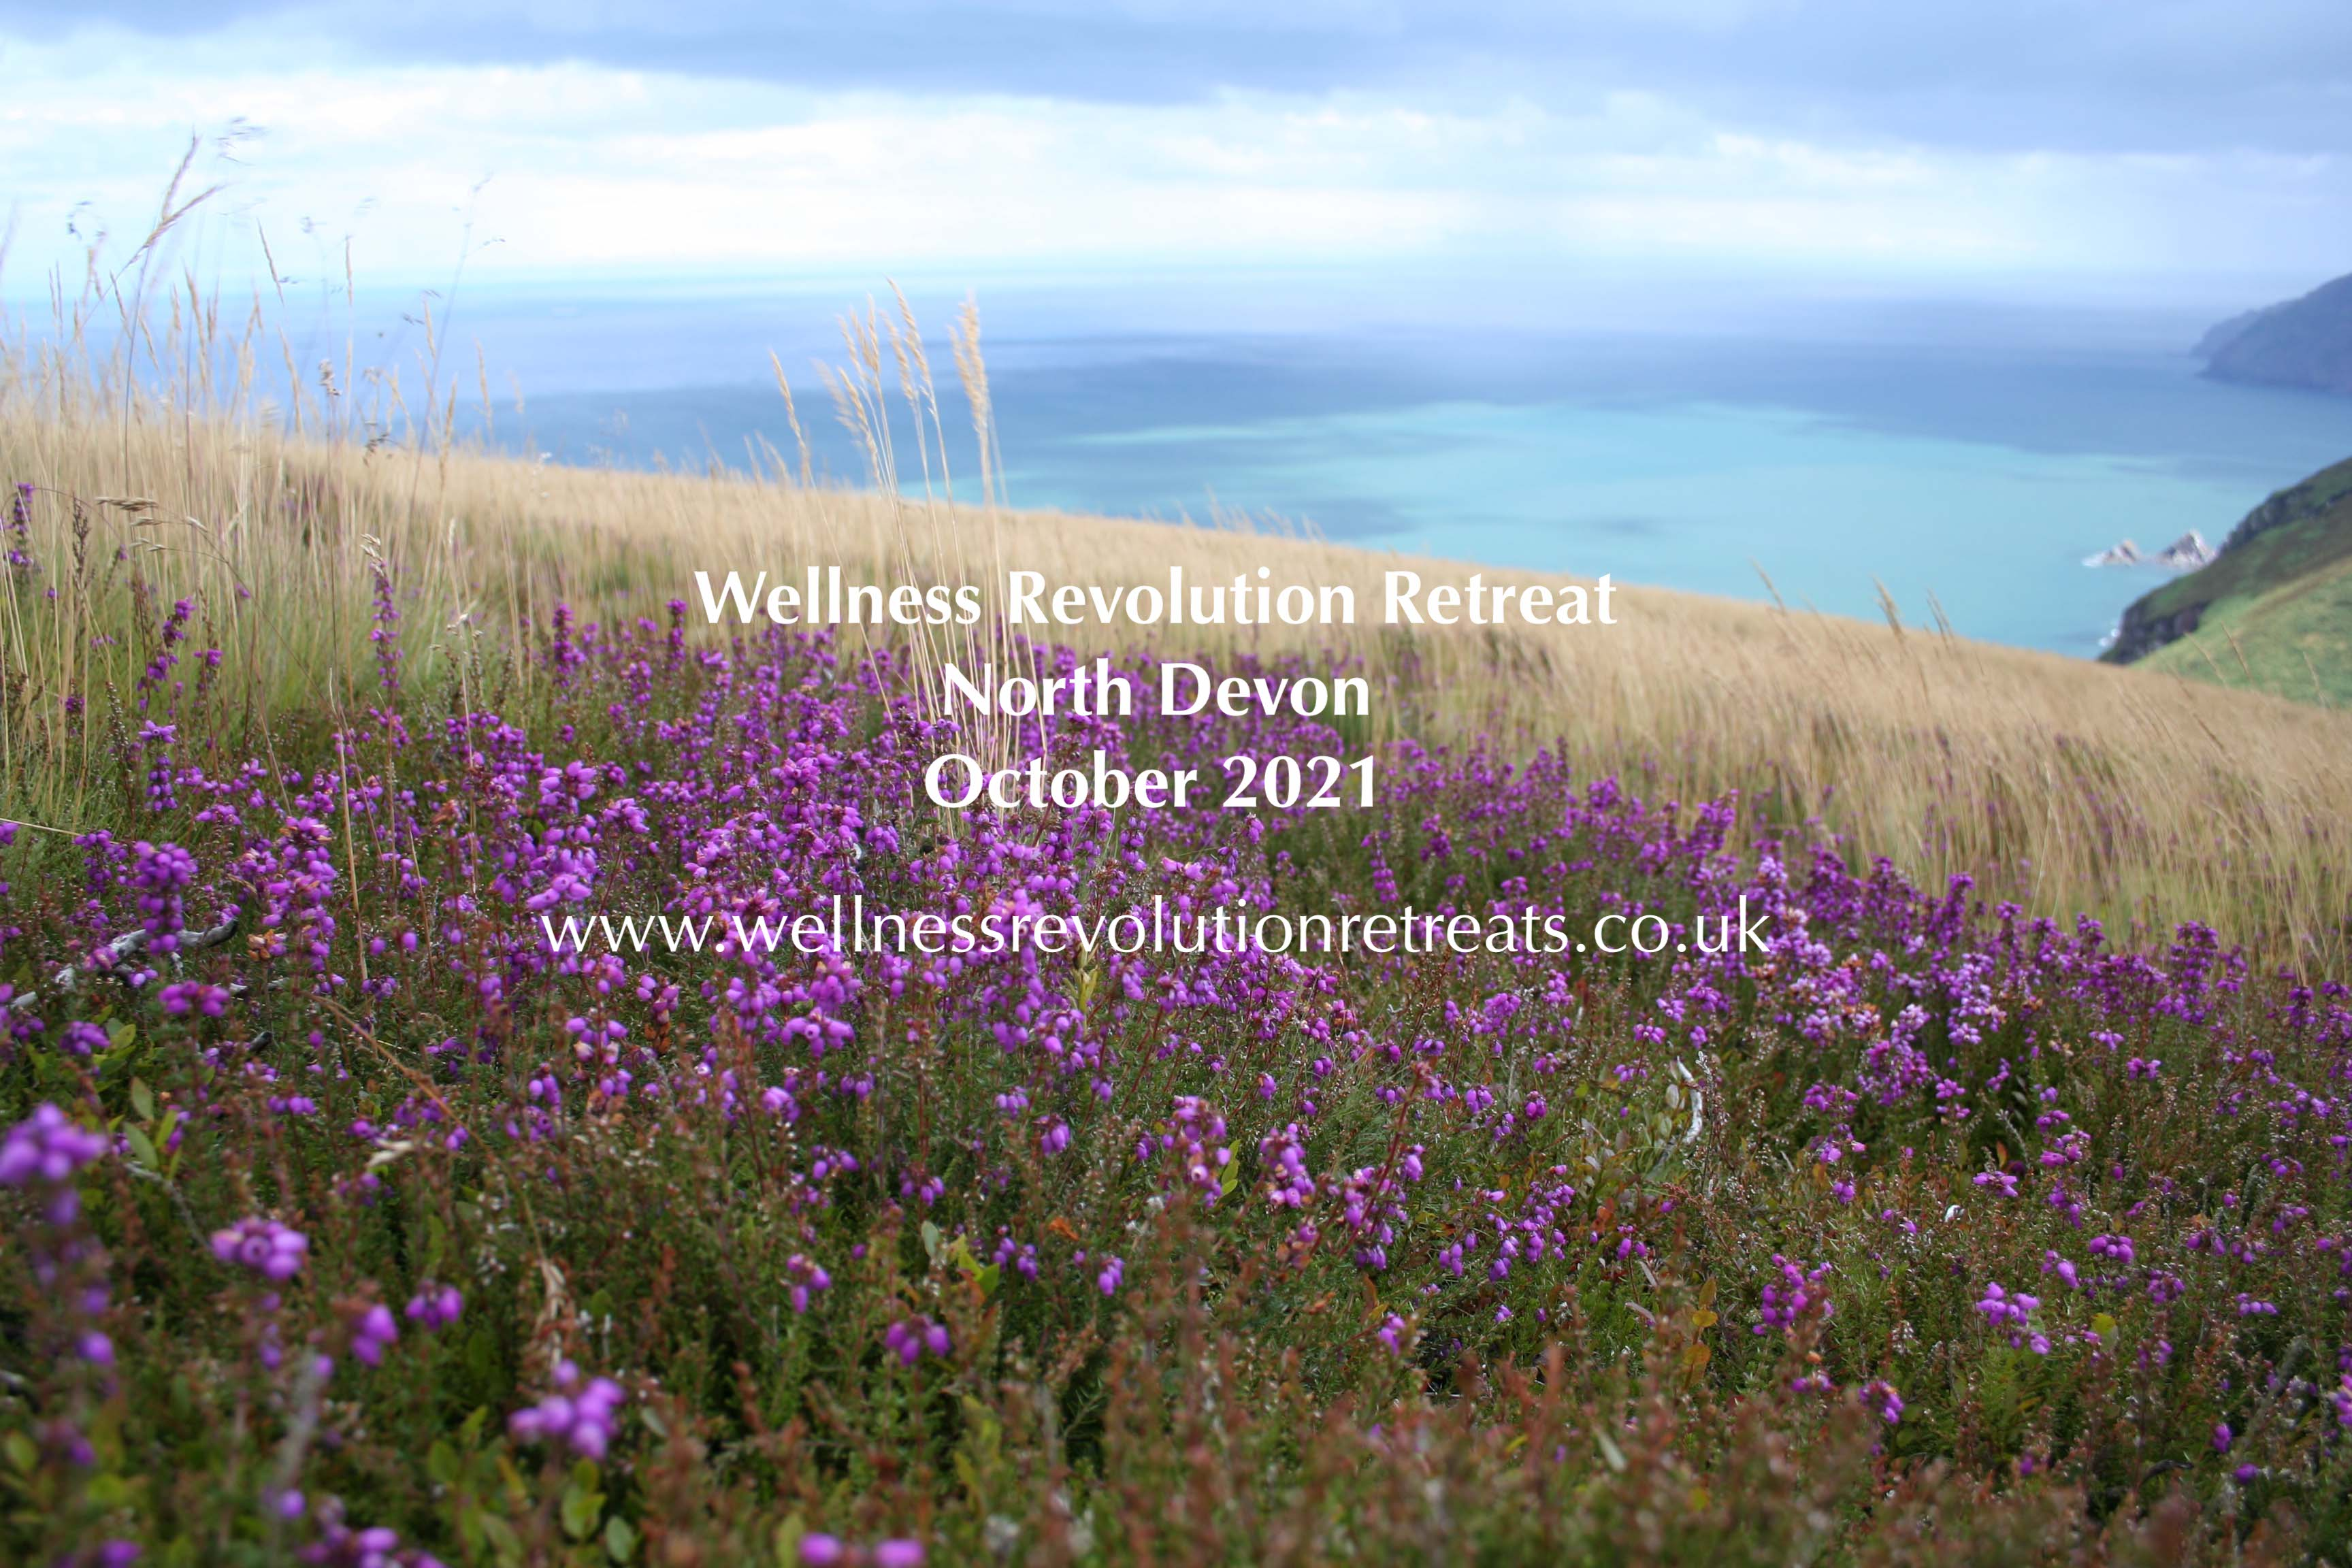 Womens' Yoga Retreat